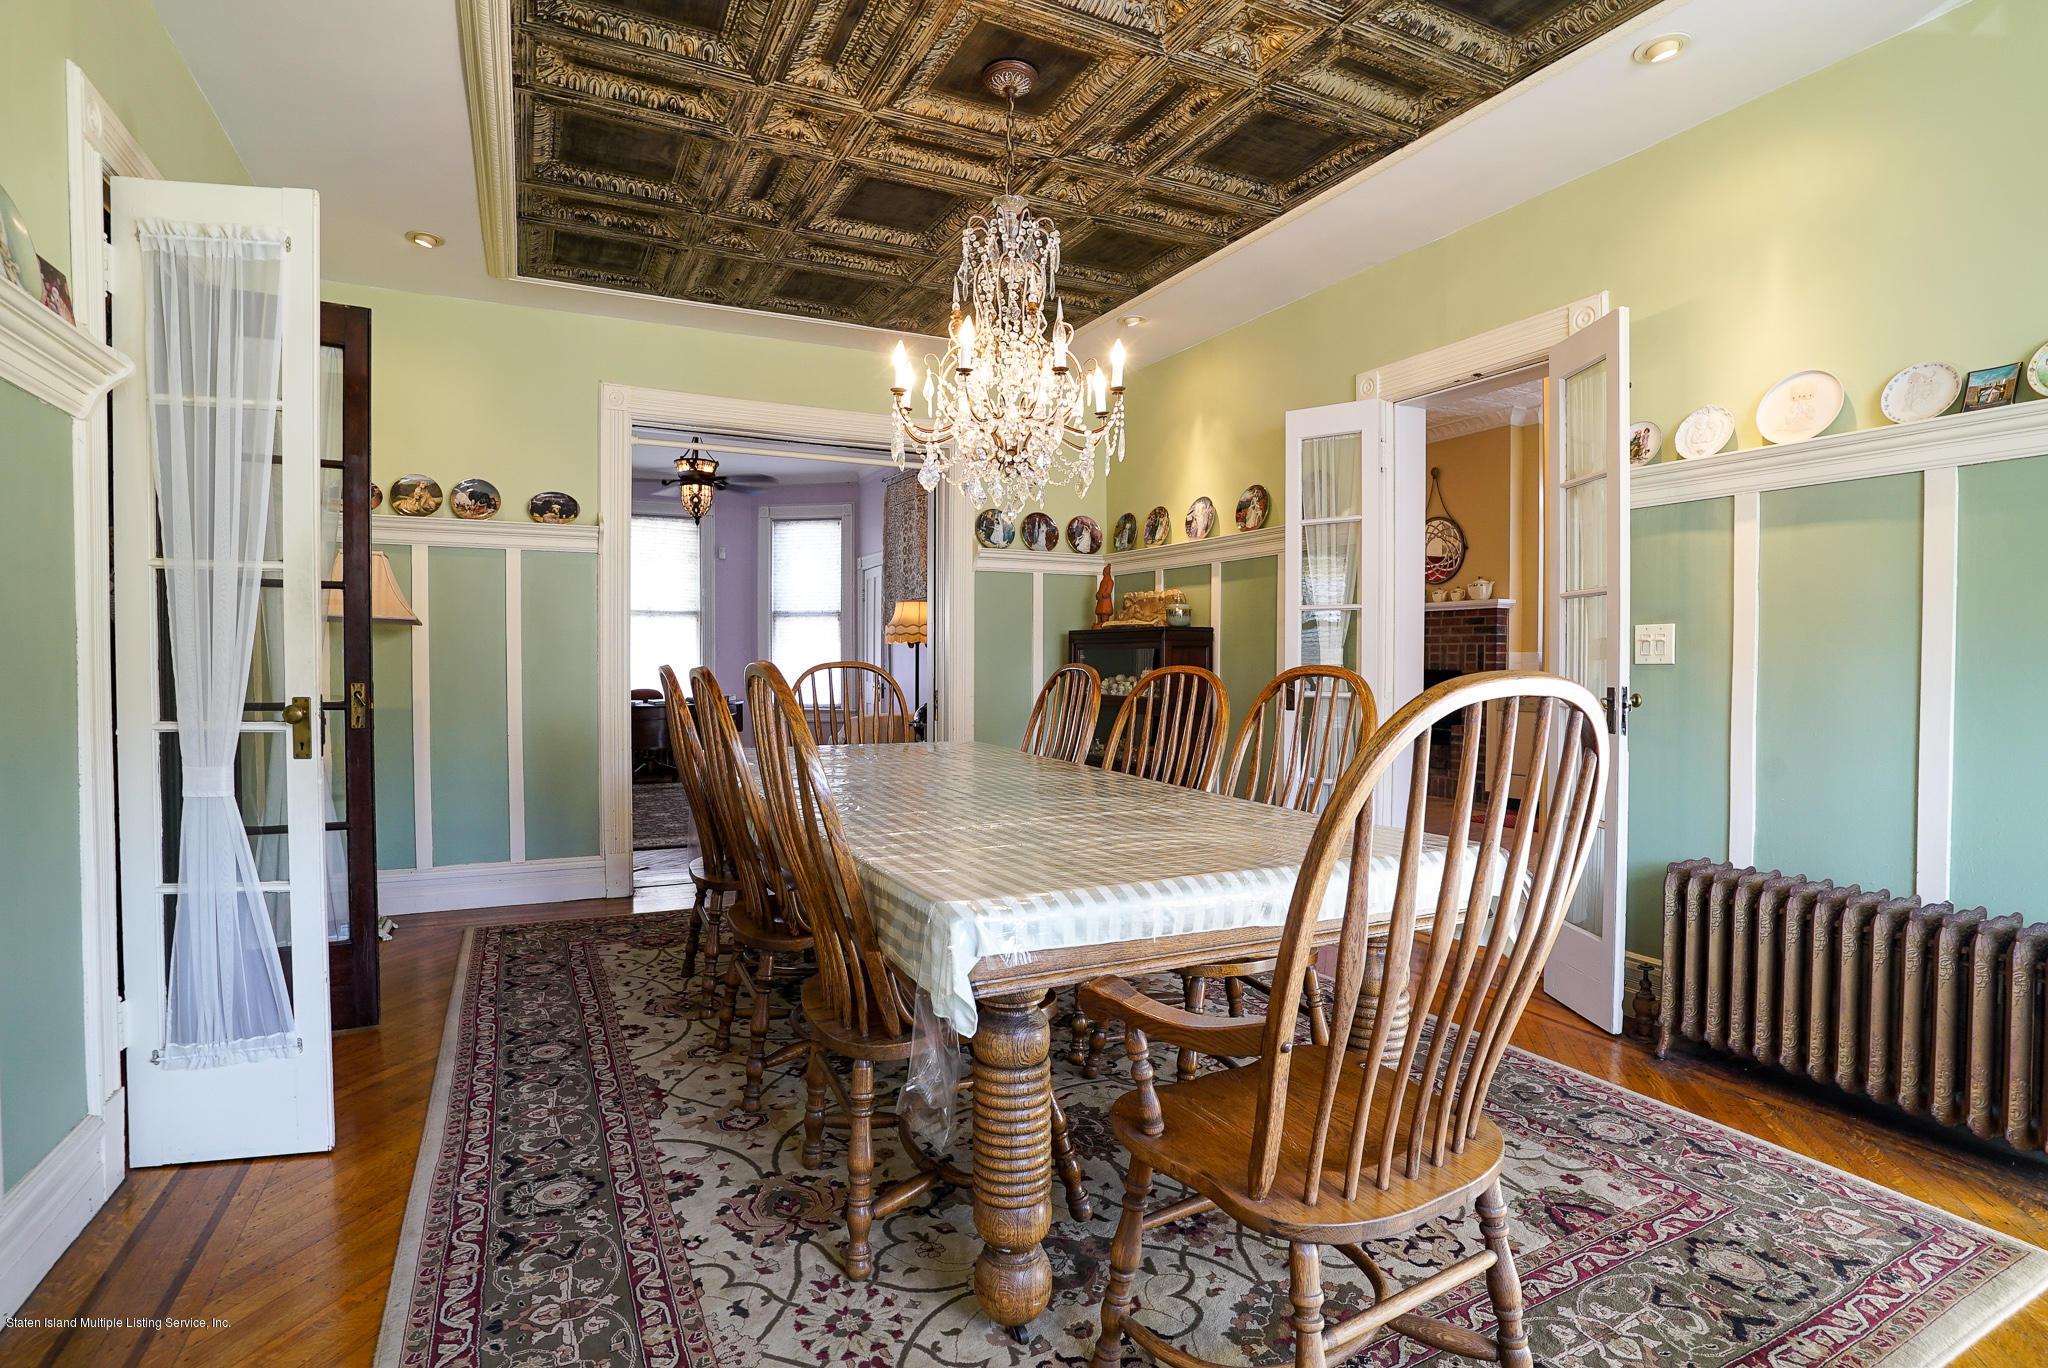 Single Family - Detached 309 Guyon Avenue  Staten Island, NY 10306, MLS-1142302-21